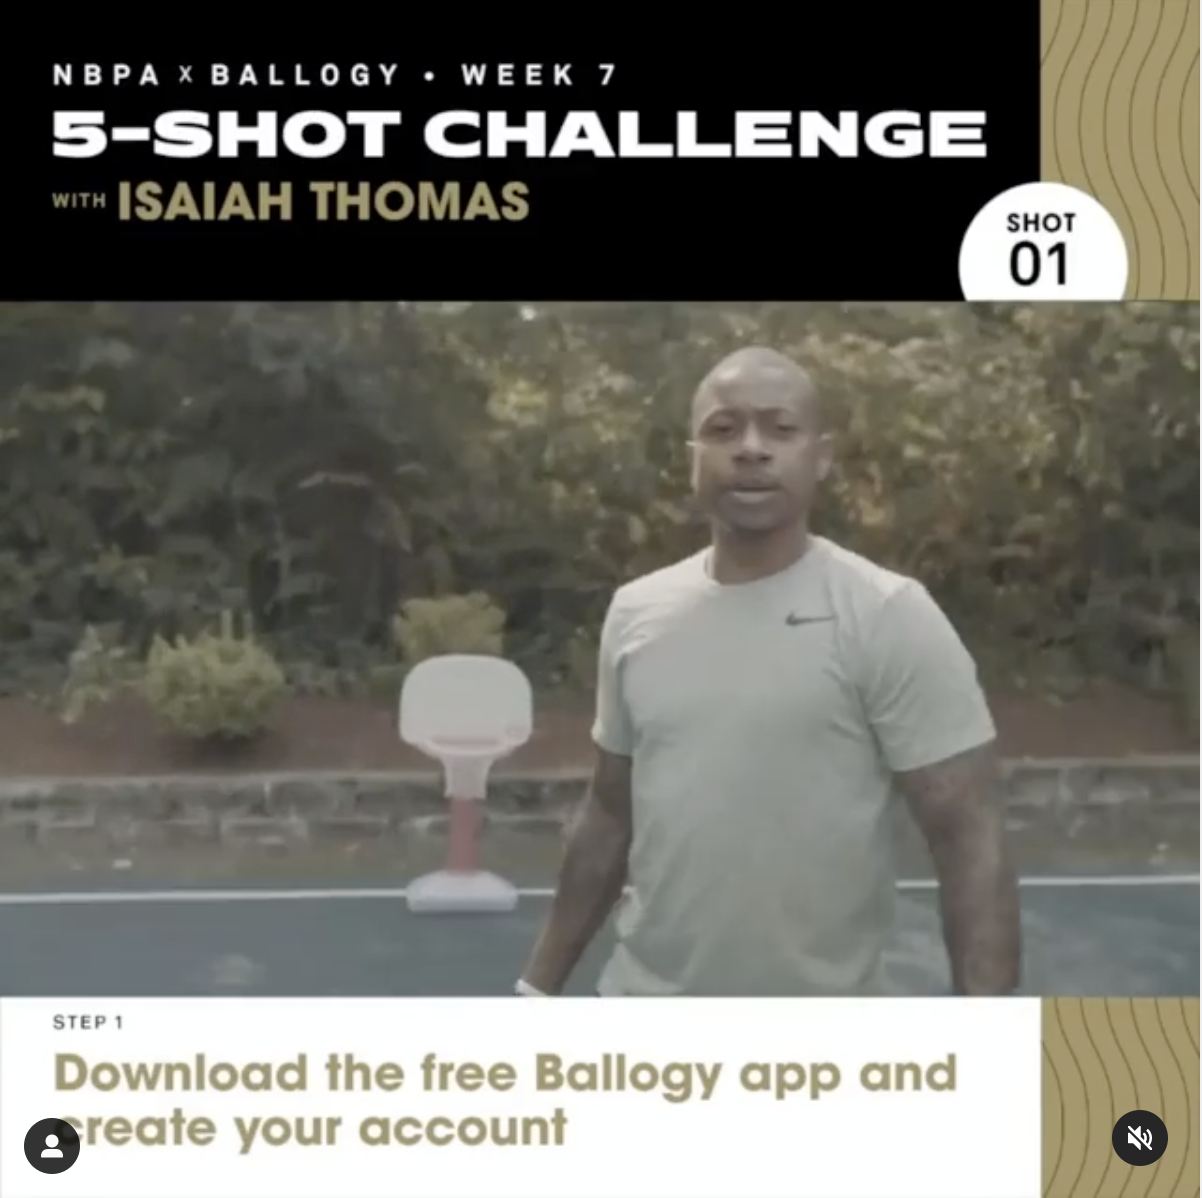 NBPA x Ballogy 5-Shot Challenge: Isaiah Thomas